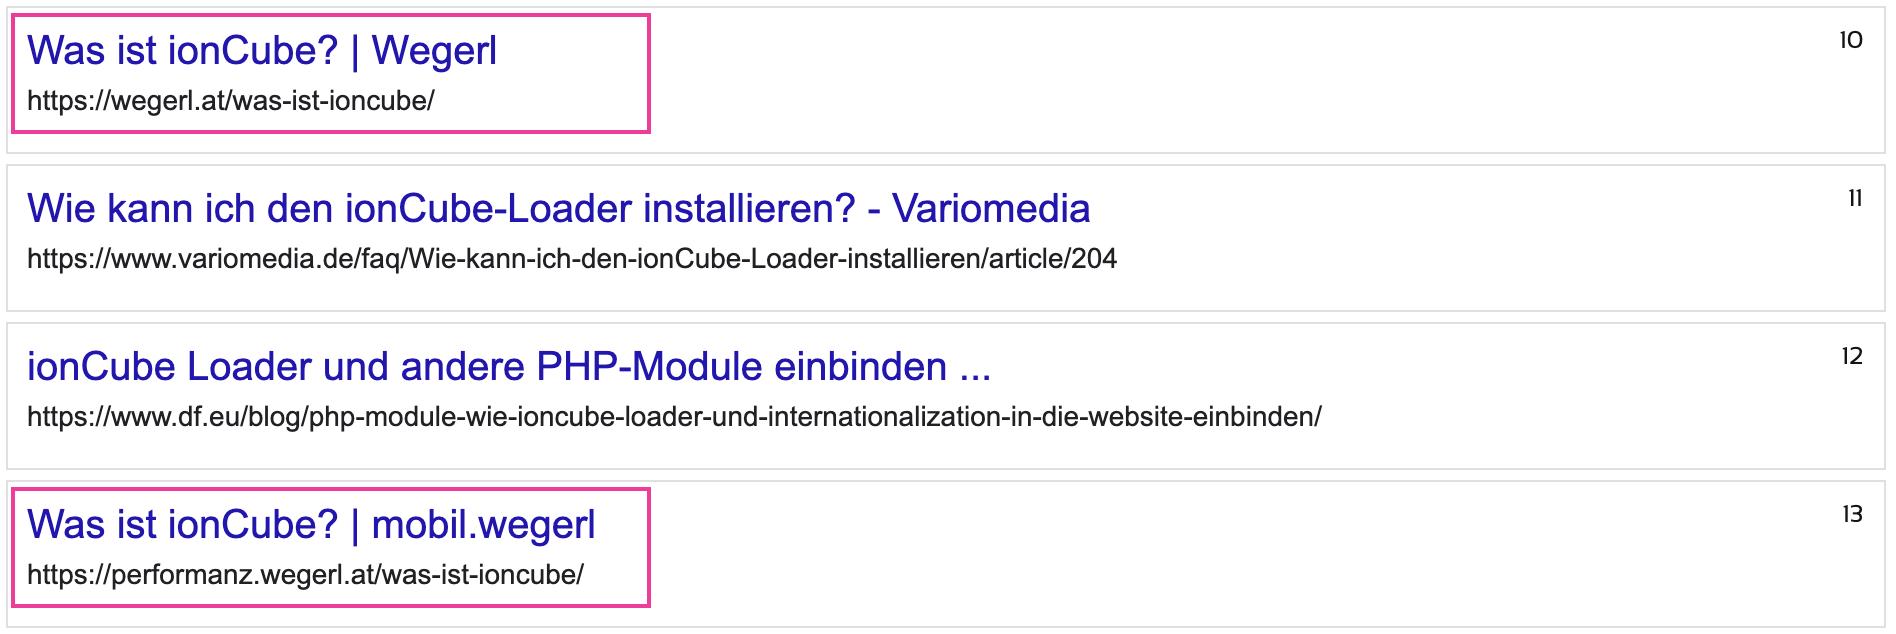 Suchergebnisse Hauptseite vs. mobil